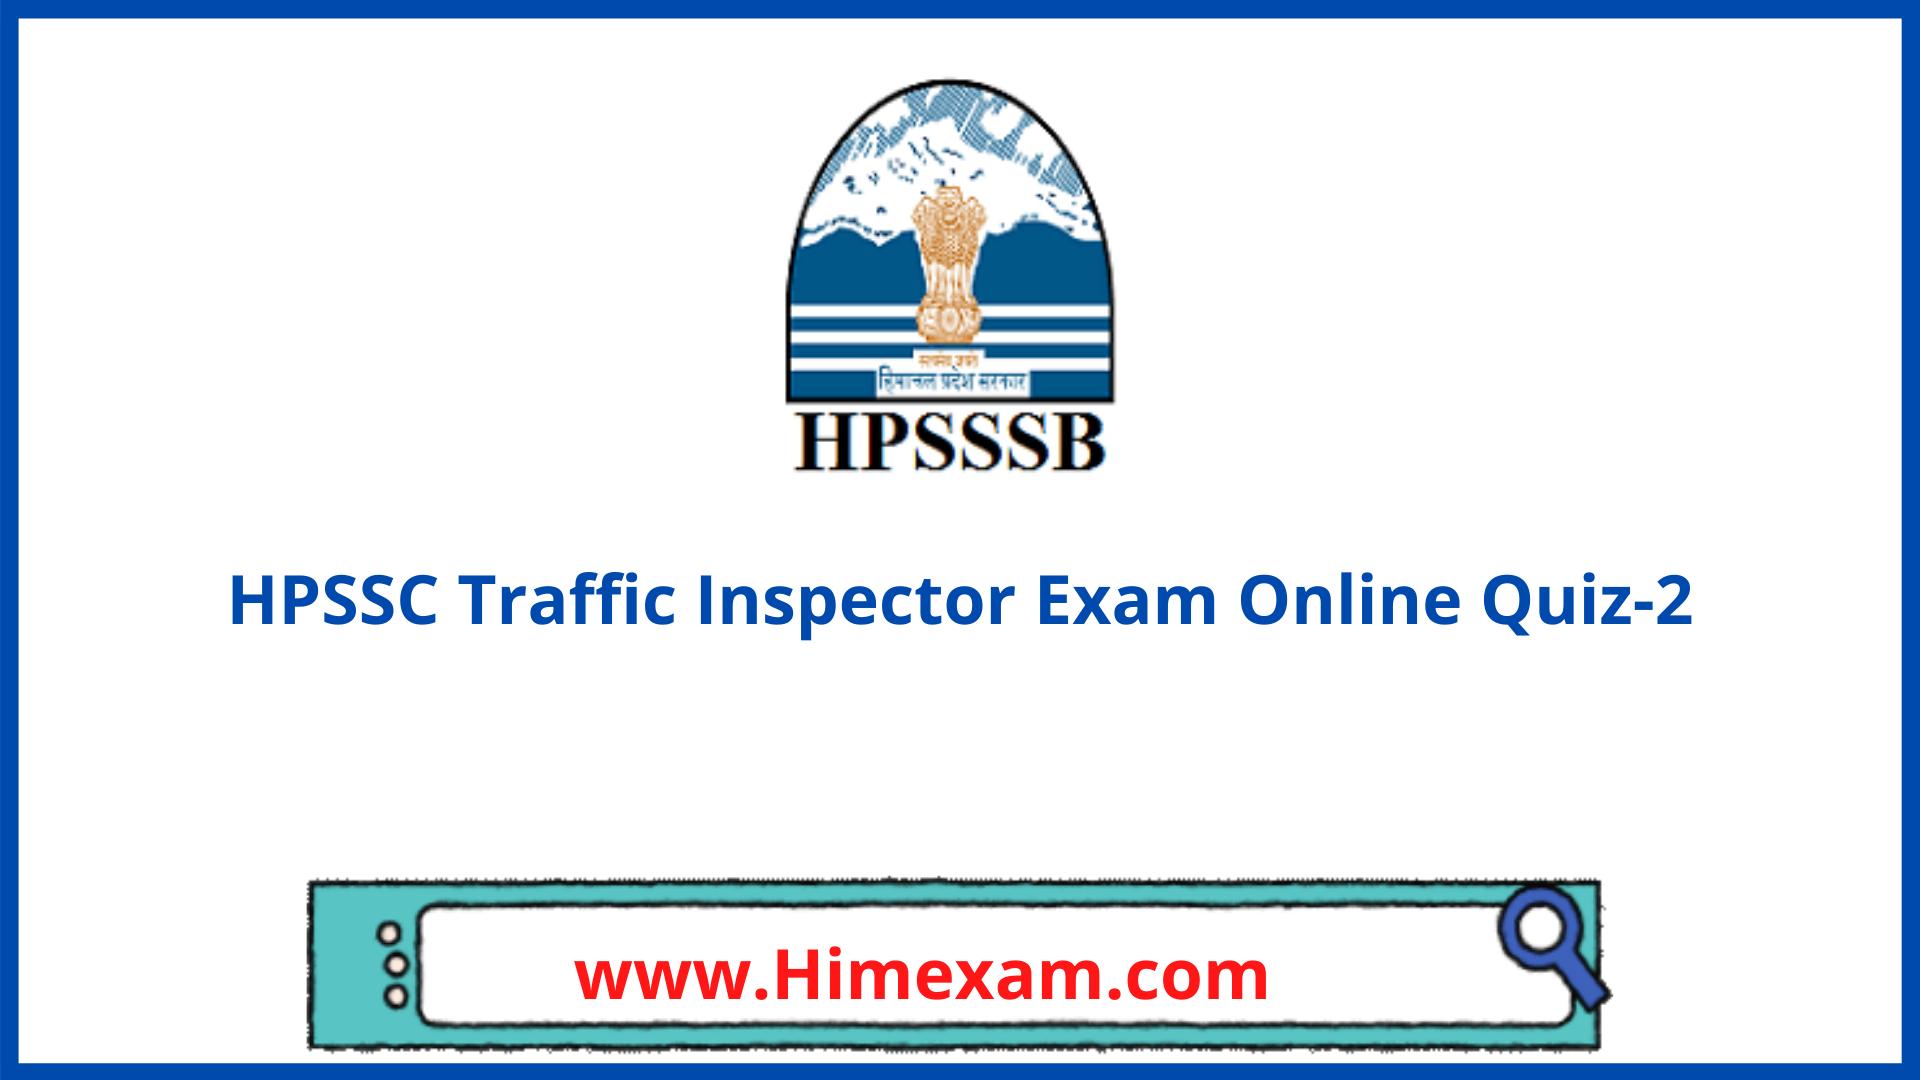 HPSSC Traffic Inspector Exam Online Quiz-2